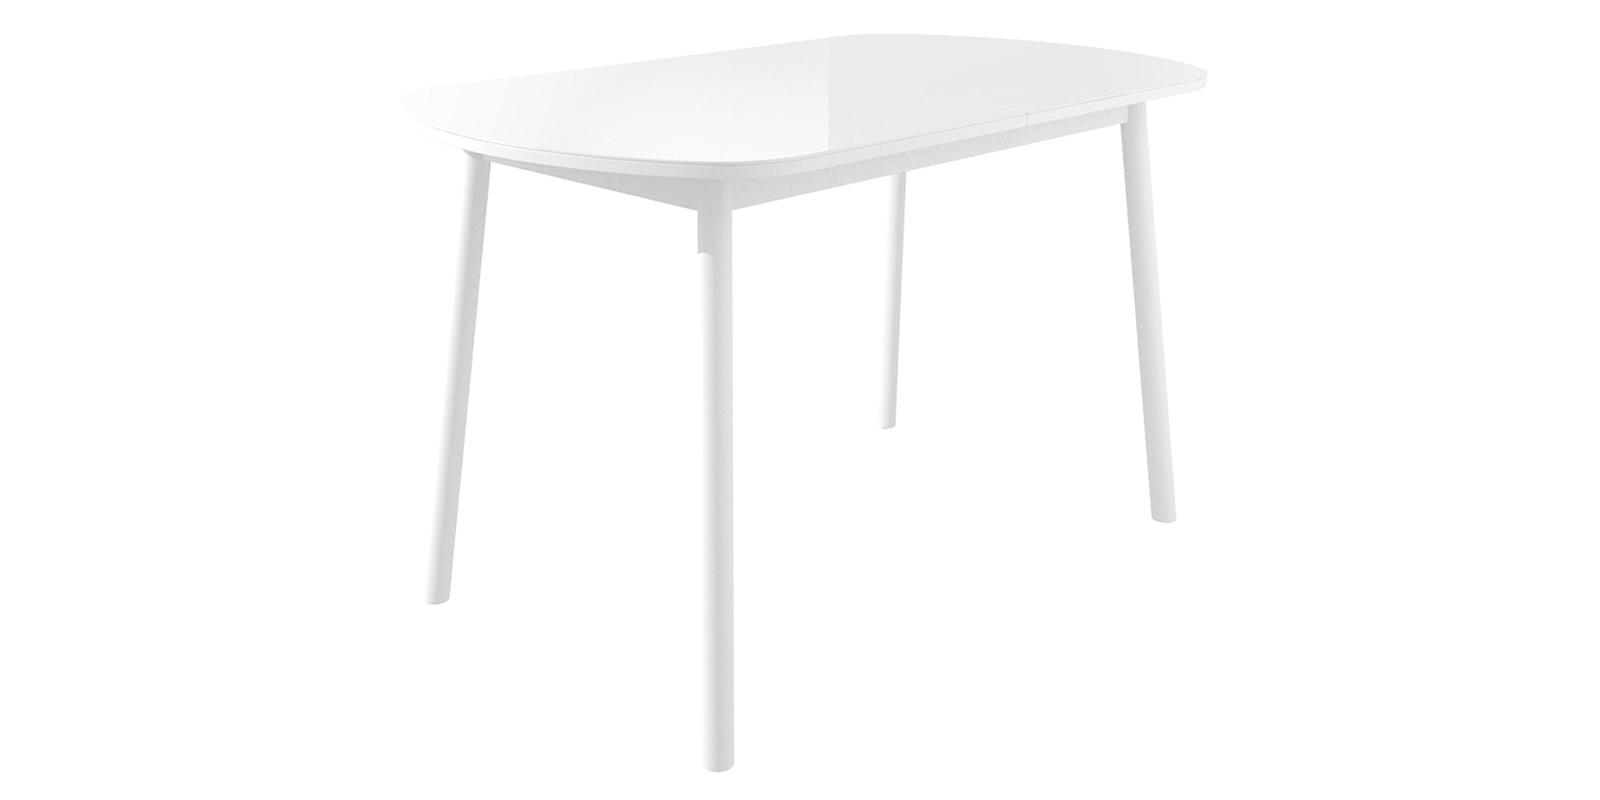 Кухонный стол HomeMe Раунд мини от Homeme.ru